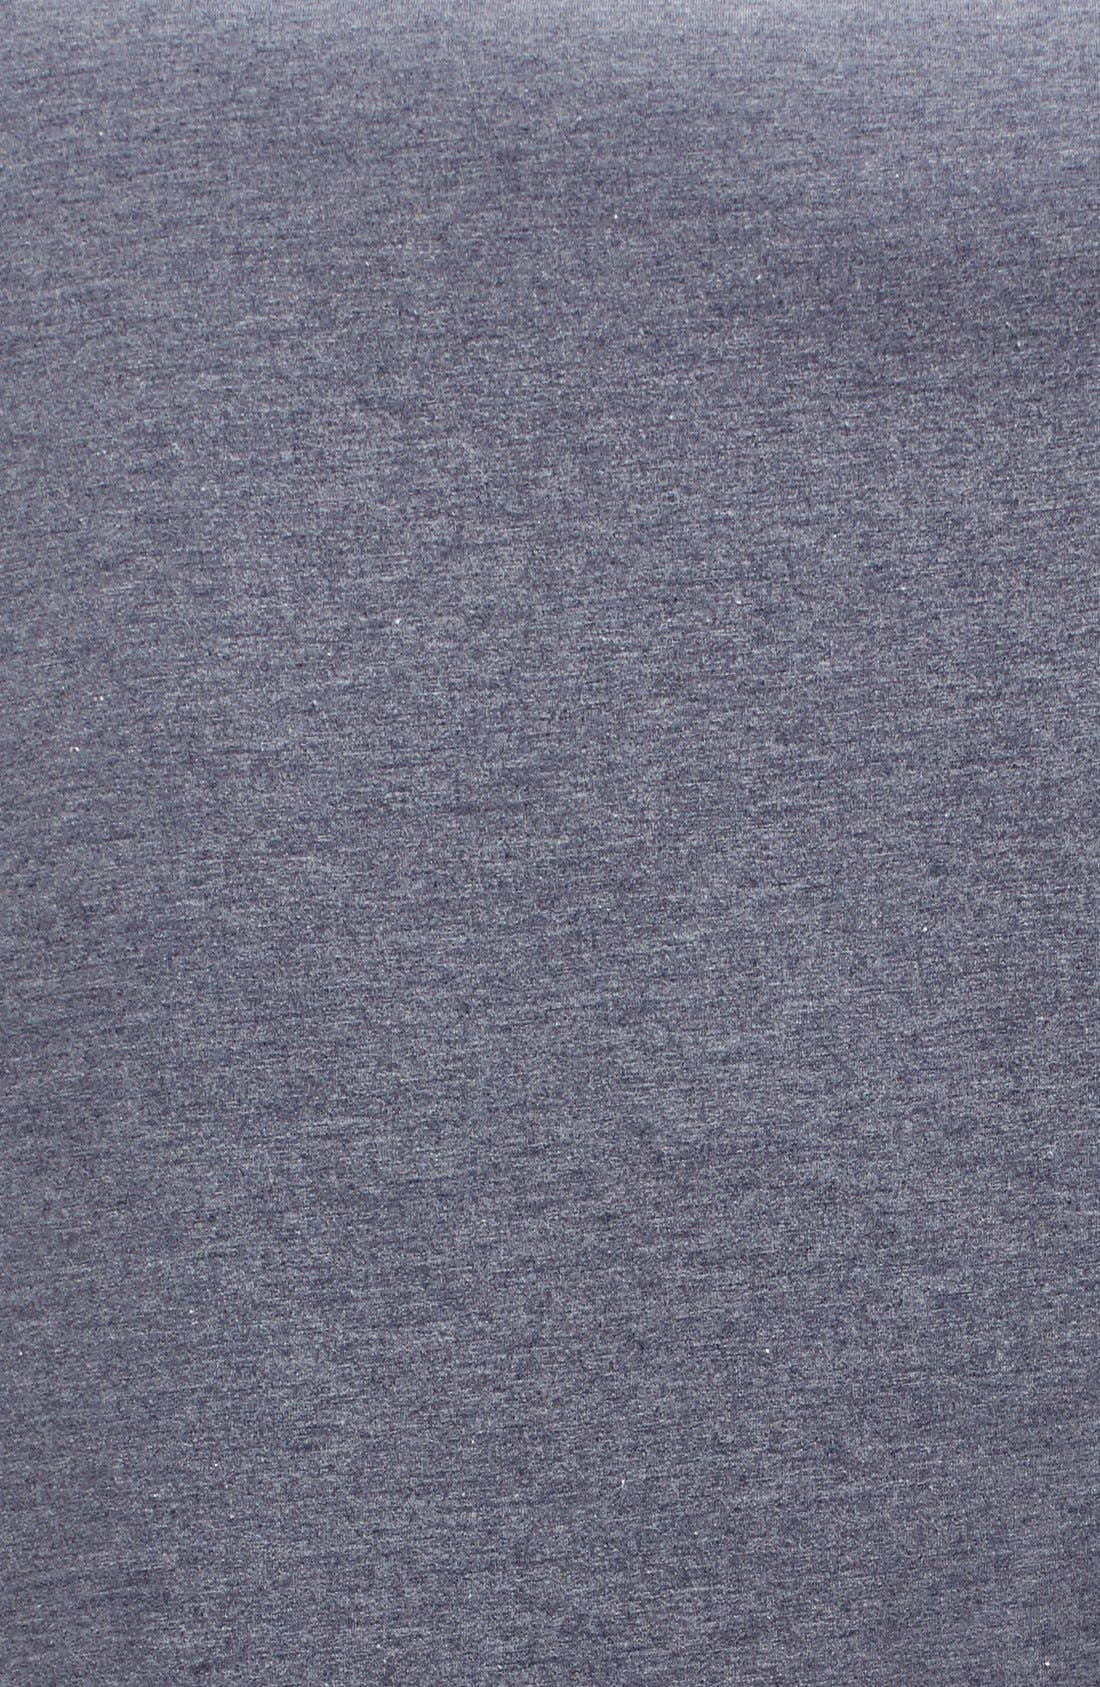 Alternate Image 2  - Nordstrom Jersey/Faux Fur Throw